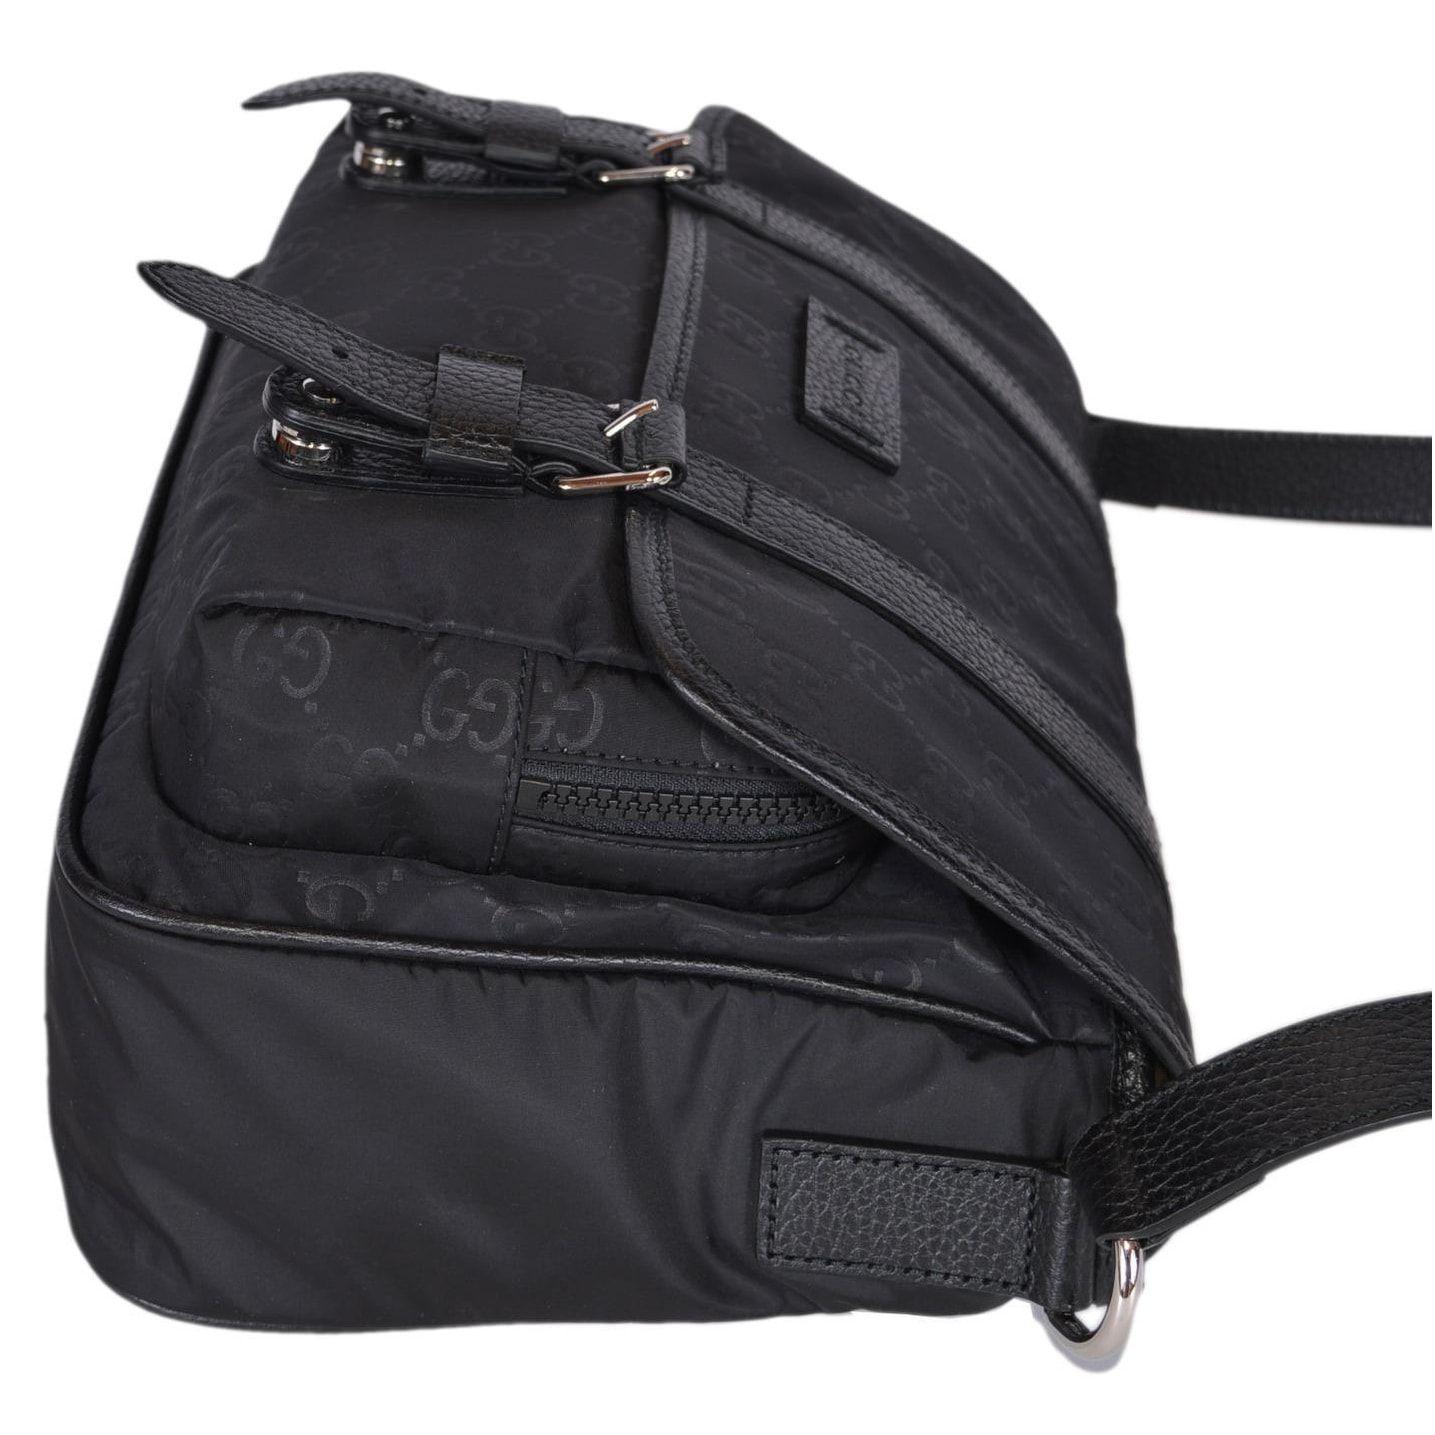 0b9f3ec1c49c Gucci 510335 Black Nylon Leather GG Guccissima Messenger Bag Crossbody Purse  - 11.5